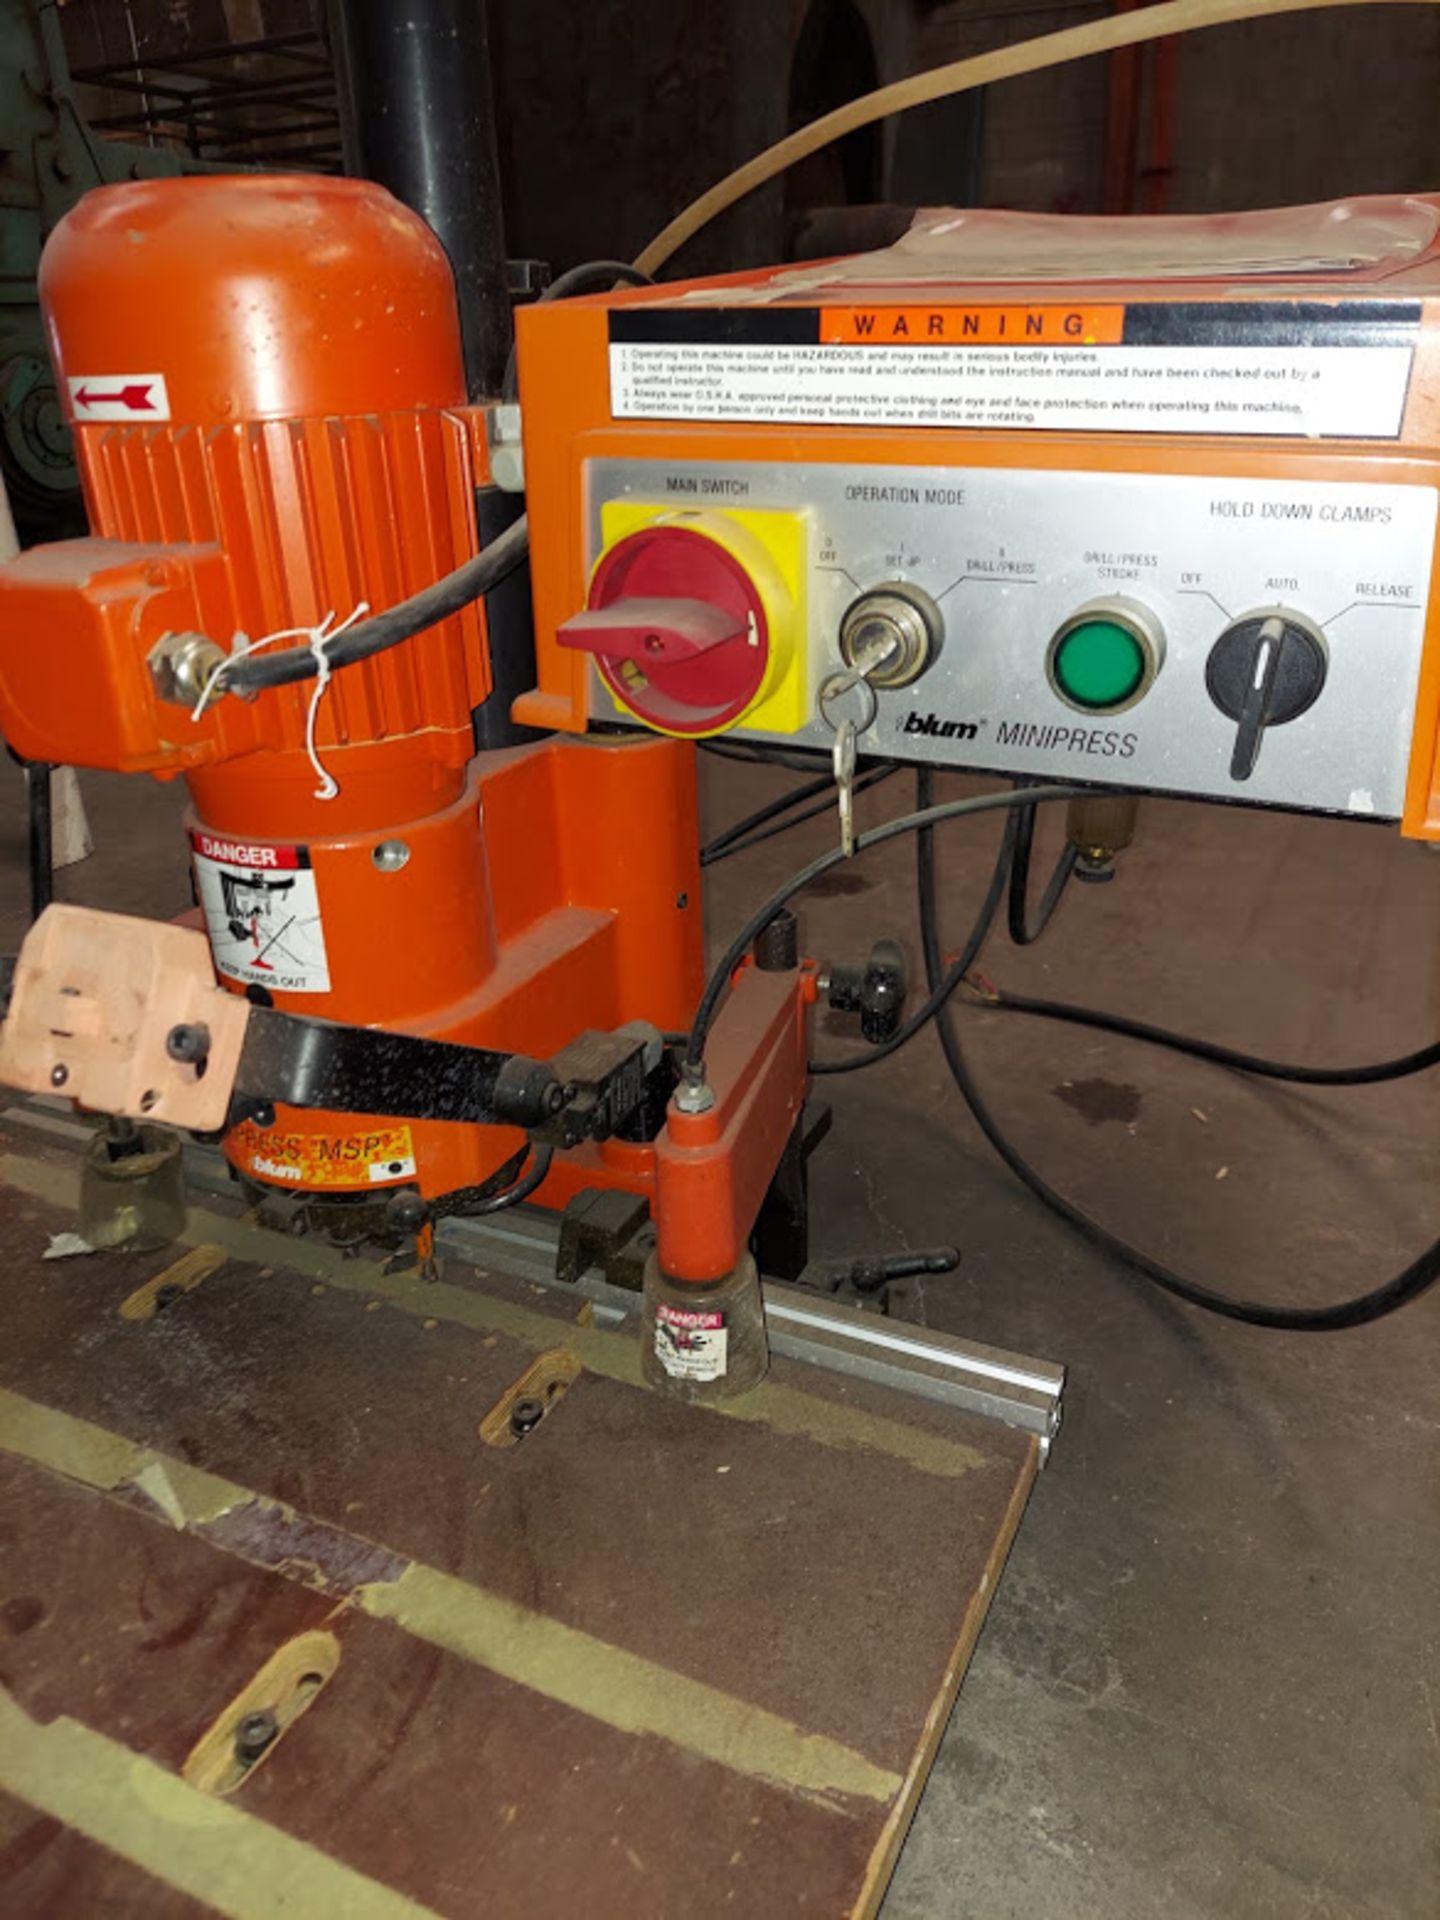 Blum Hinge Boring Machine, Ref #M51N1004 , 0.75 KW 230 Volts 3 Phase - Image 3 of 4